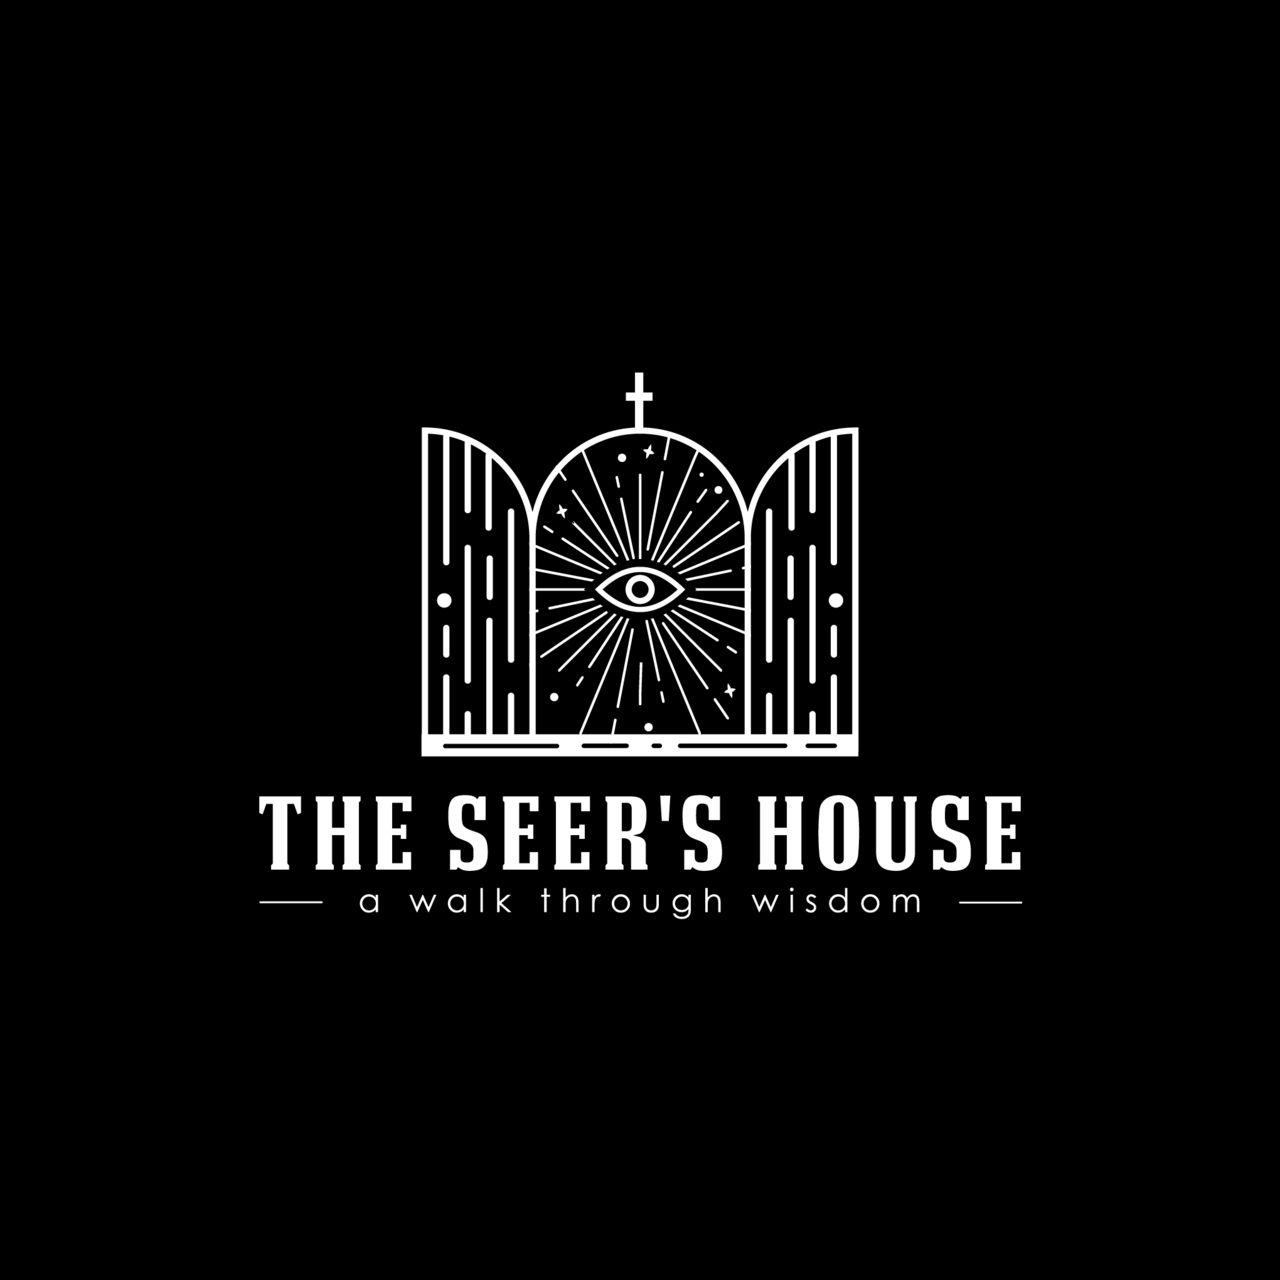 The Seer's House